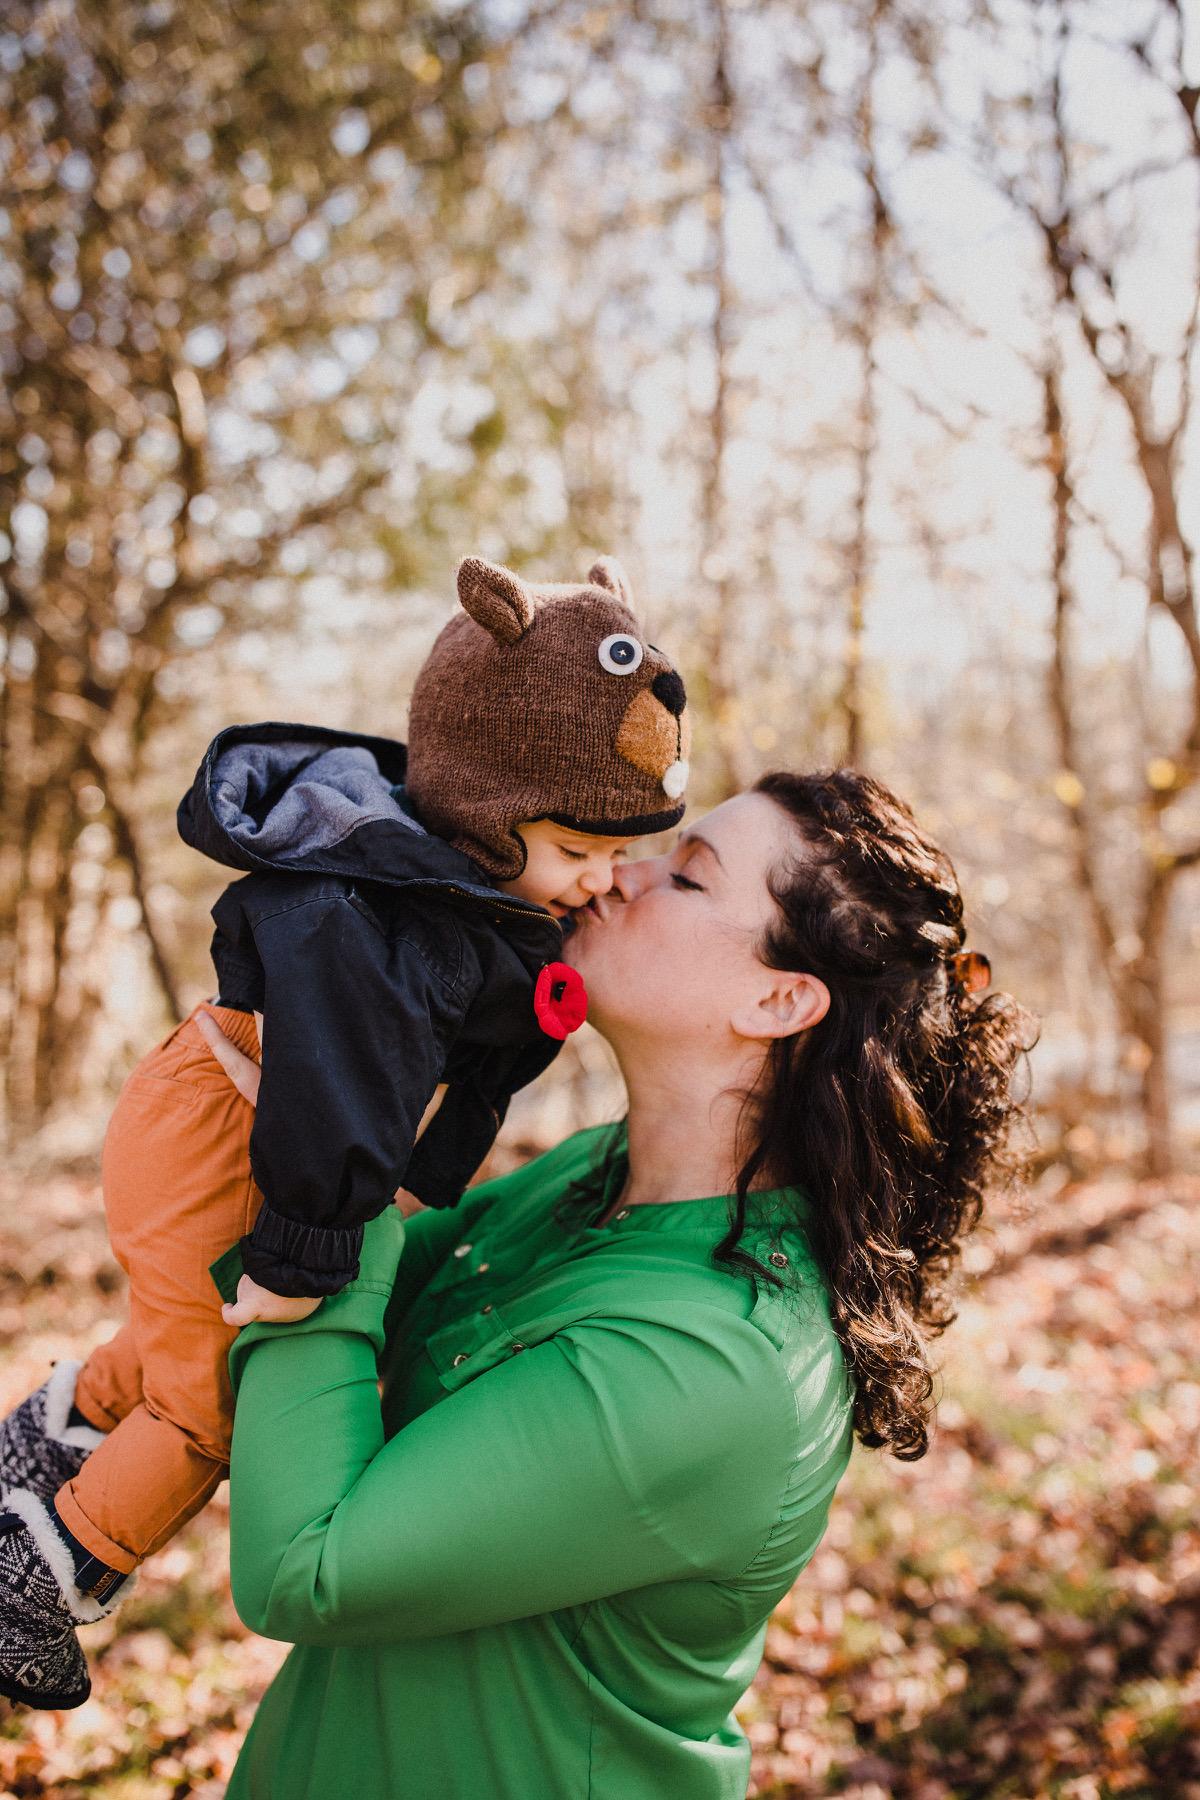 Alana Robertson poses with her son Deacon